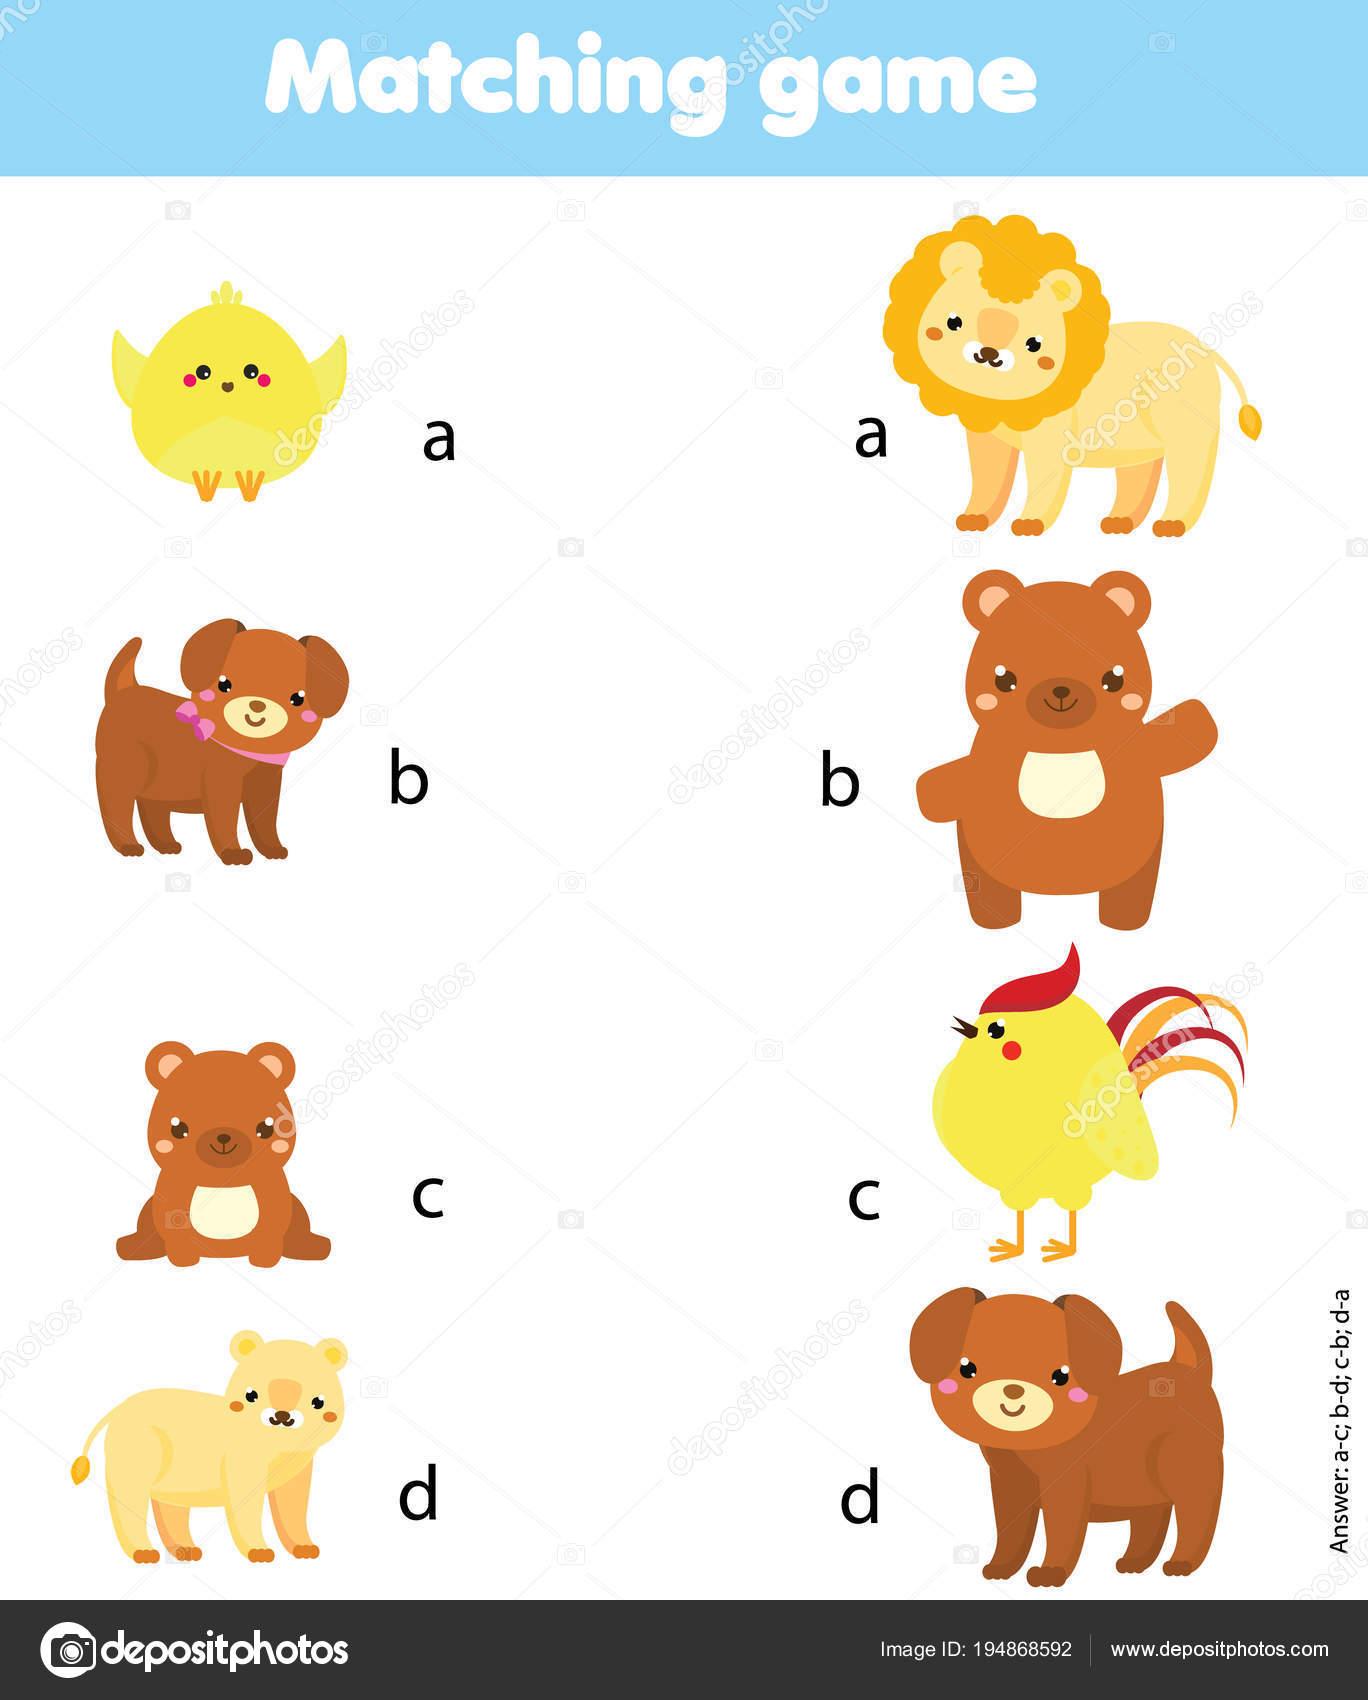 photo regarding Baby Animal Match Game Printable known as Animal toddlers matching activity Matching activity. Sport animal